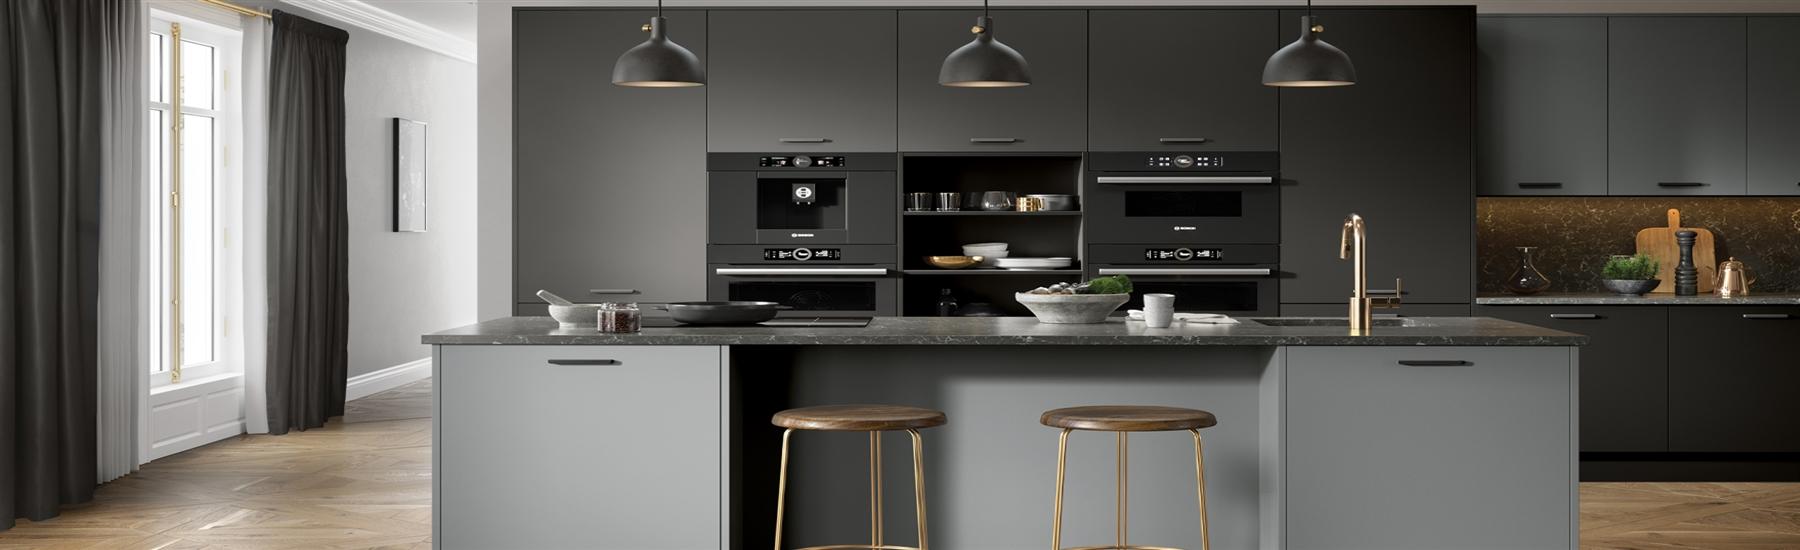 firbeck-kitchen-cupboard-doors